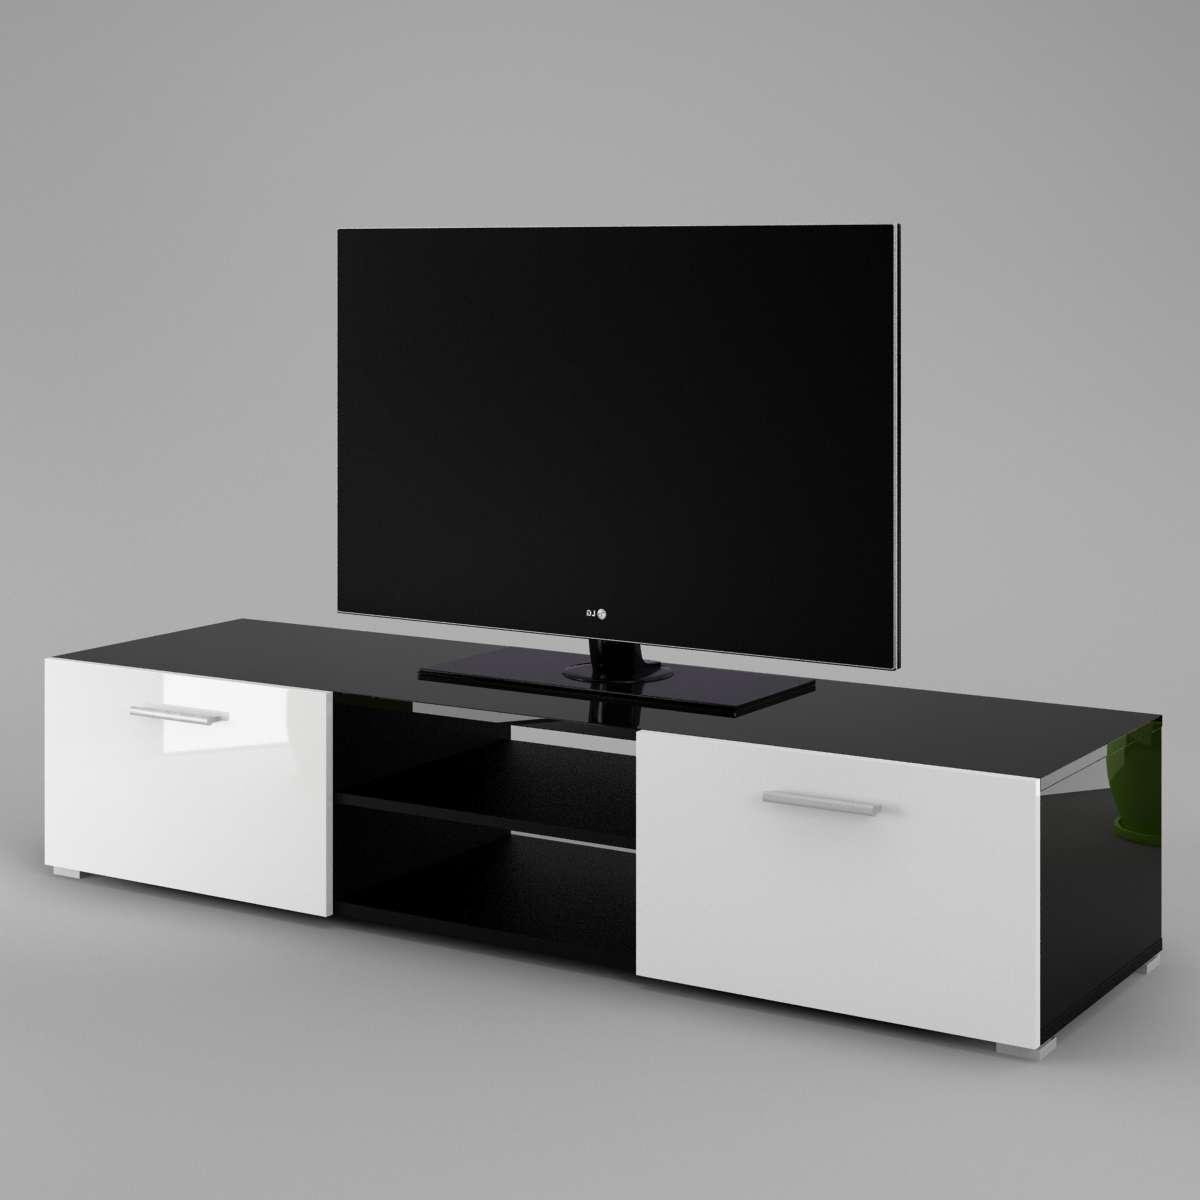 Tv Cabinet Luna – Labi Furniturelabi Furniture With Regard To High Gloss White Tv Cabinets (View 6 of 20)